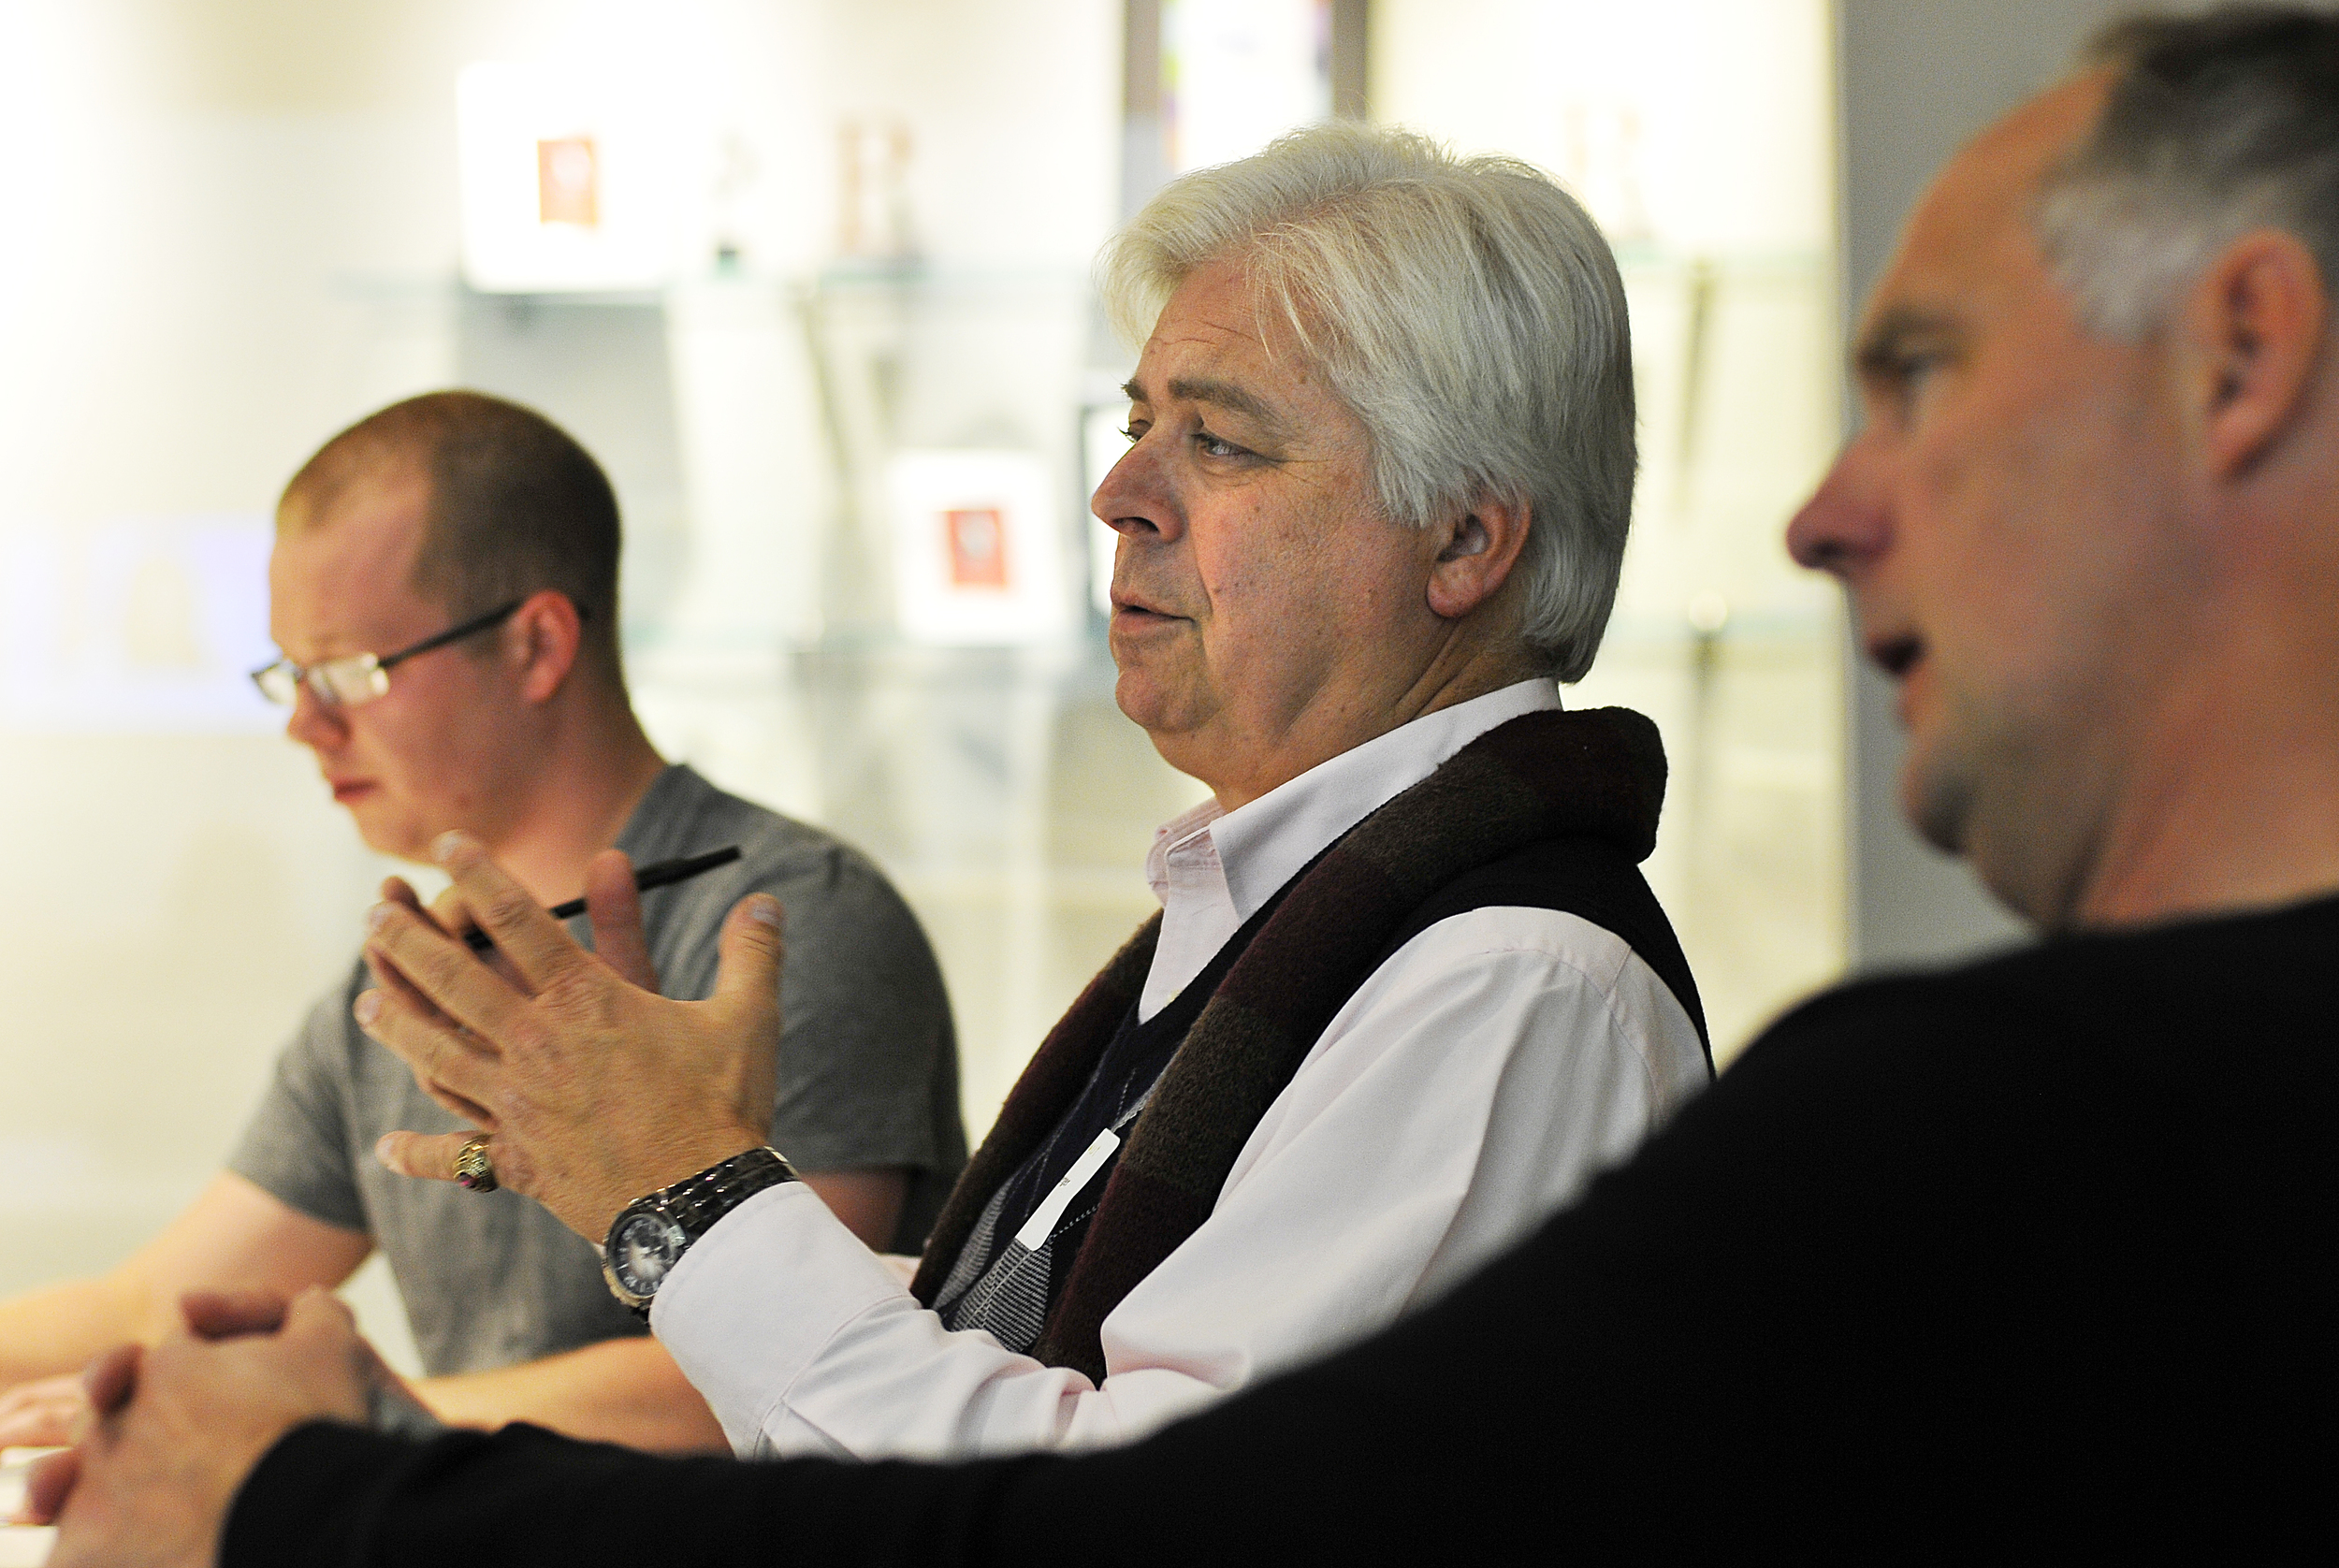 eWEEK editor Chris Preimesberger grills a presenter during a startup feedback seminar at Edelman.